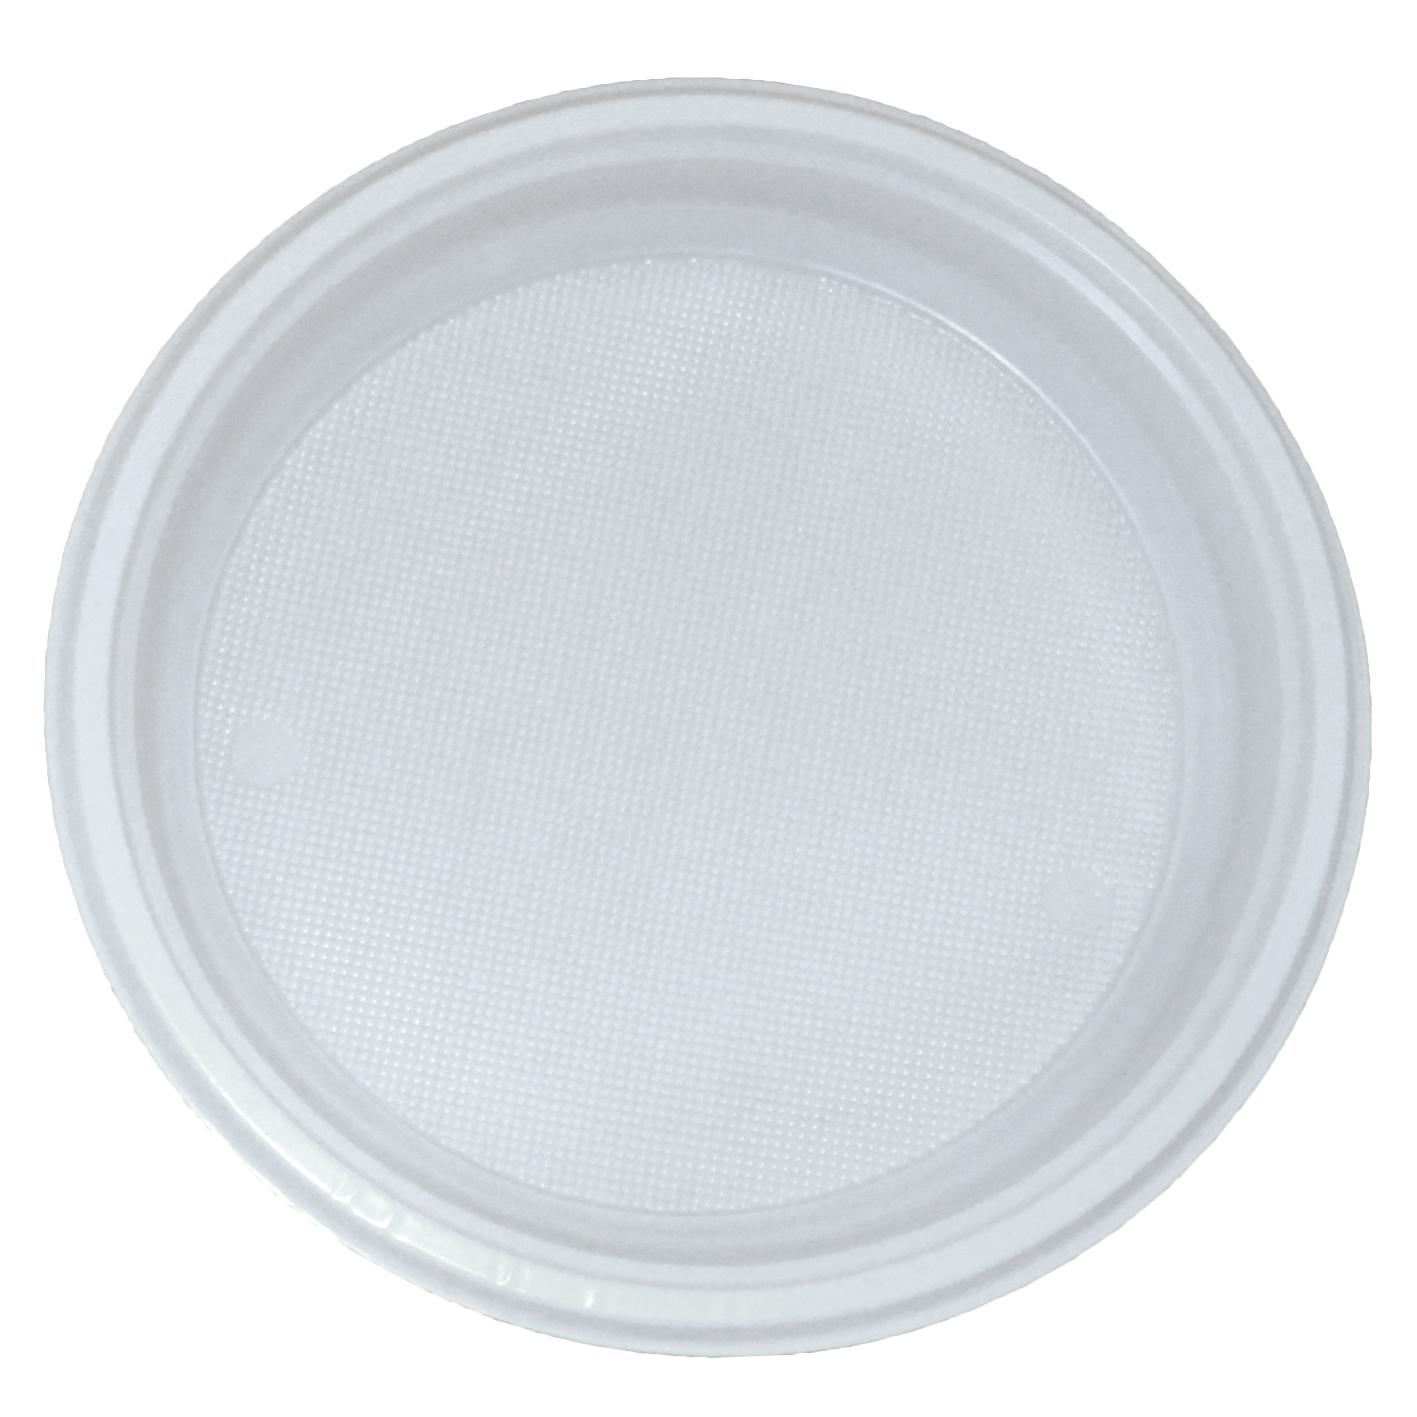 Farfurii De Unica Folosinta 22 Polipropilena (PP) Turcia 50 Buc/Set 2021 sanito.ro